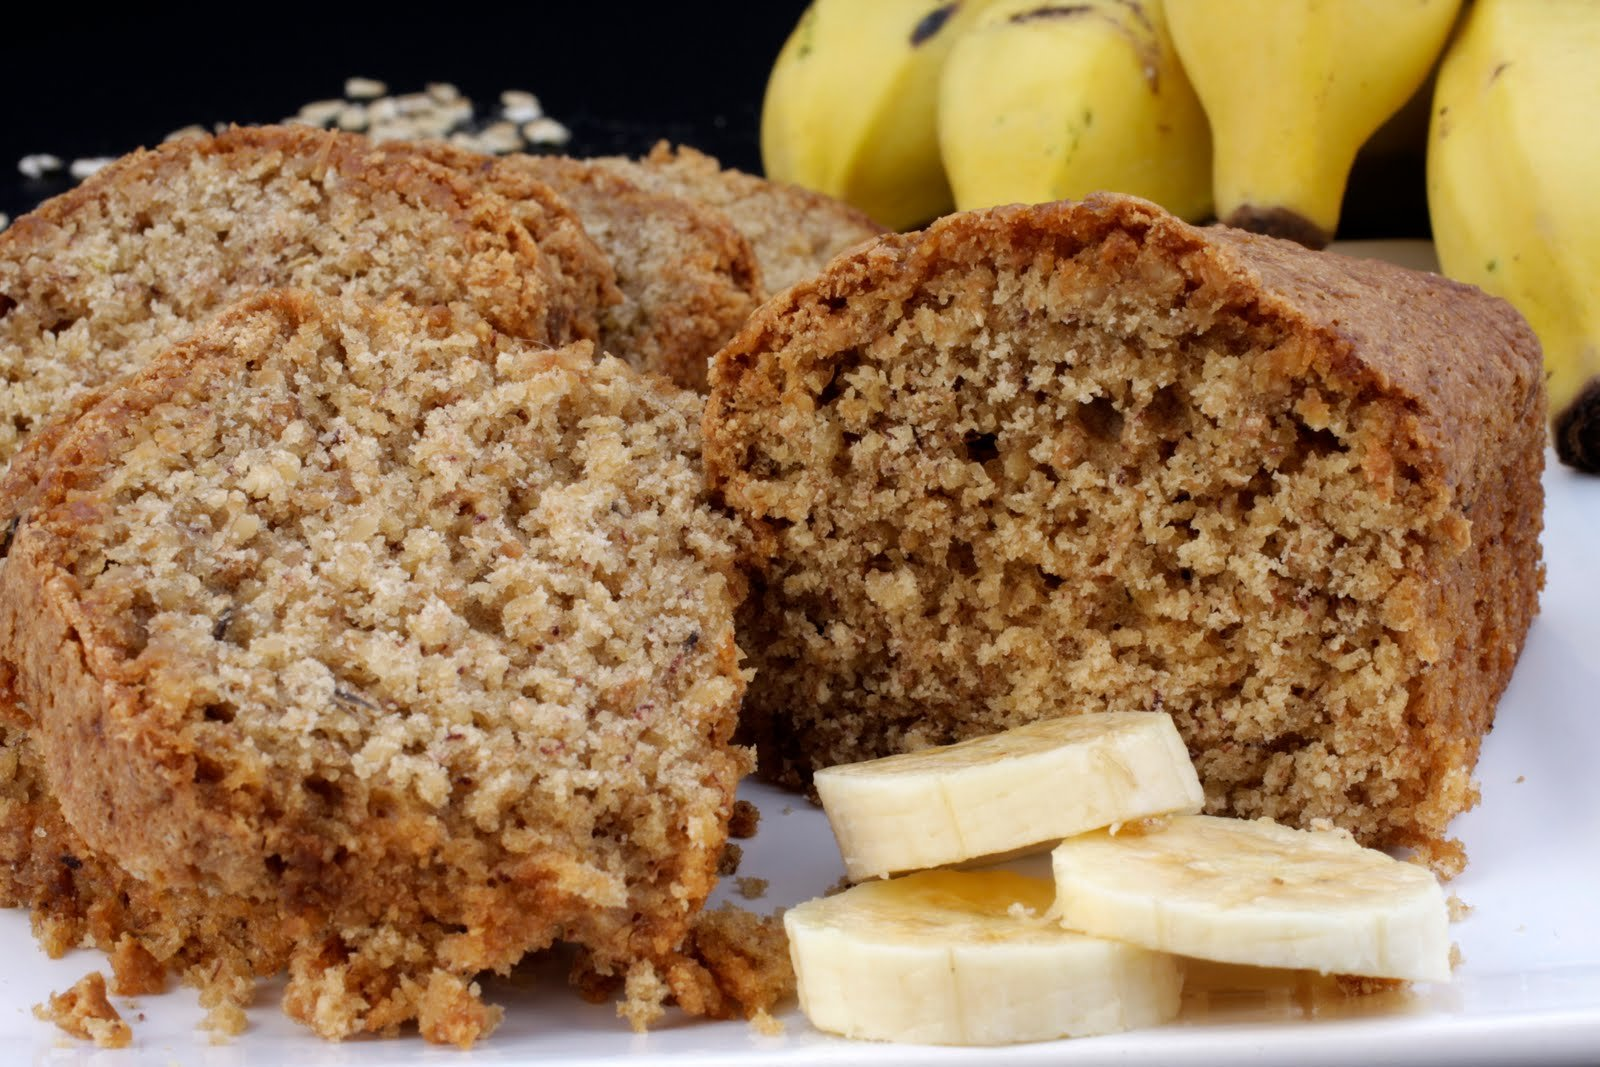 bolo de banana.jpg?resize=300,169 - Bolo Integral de banana e maçã leva chia e aveia para substituir farinha